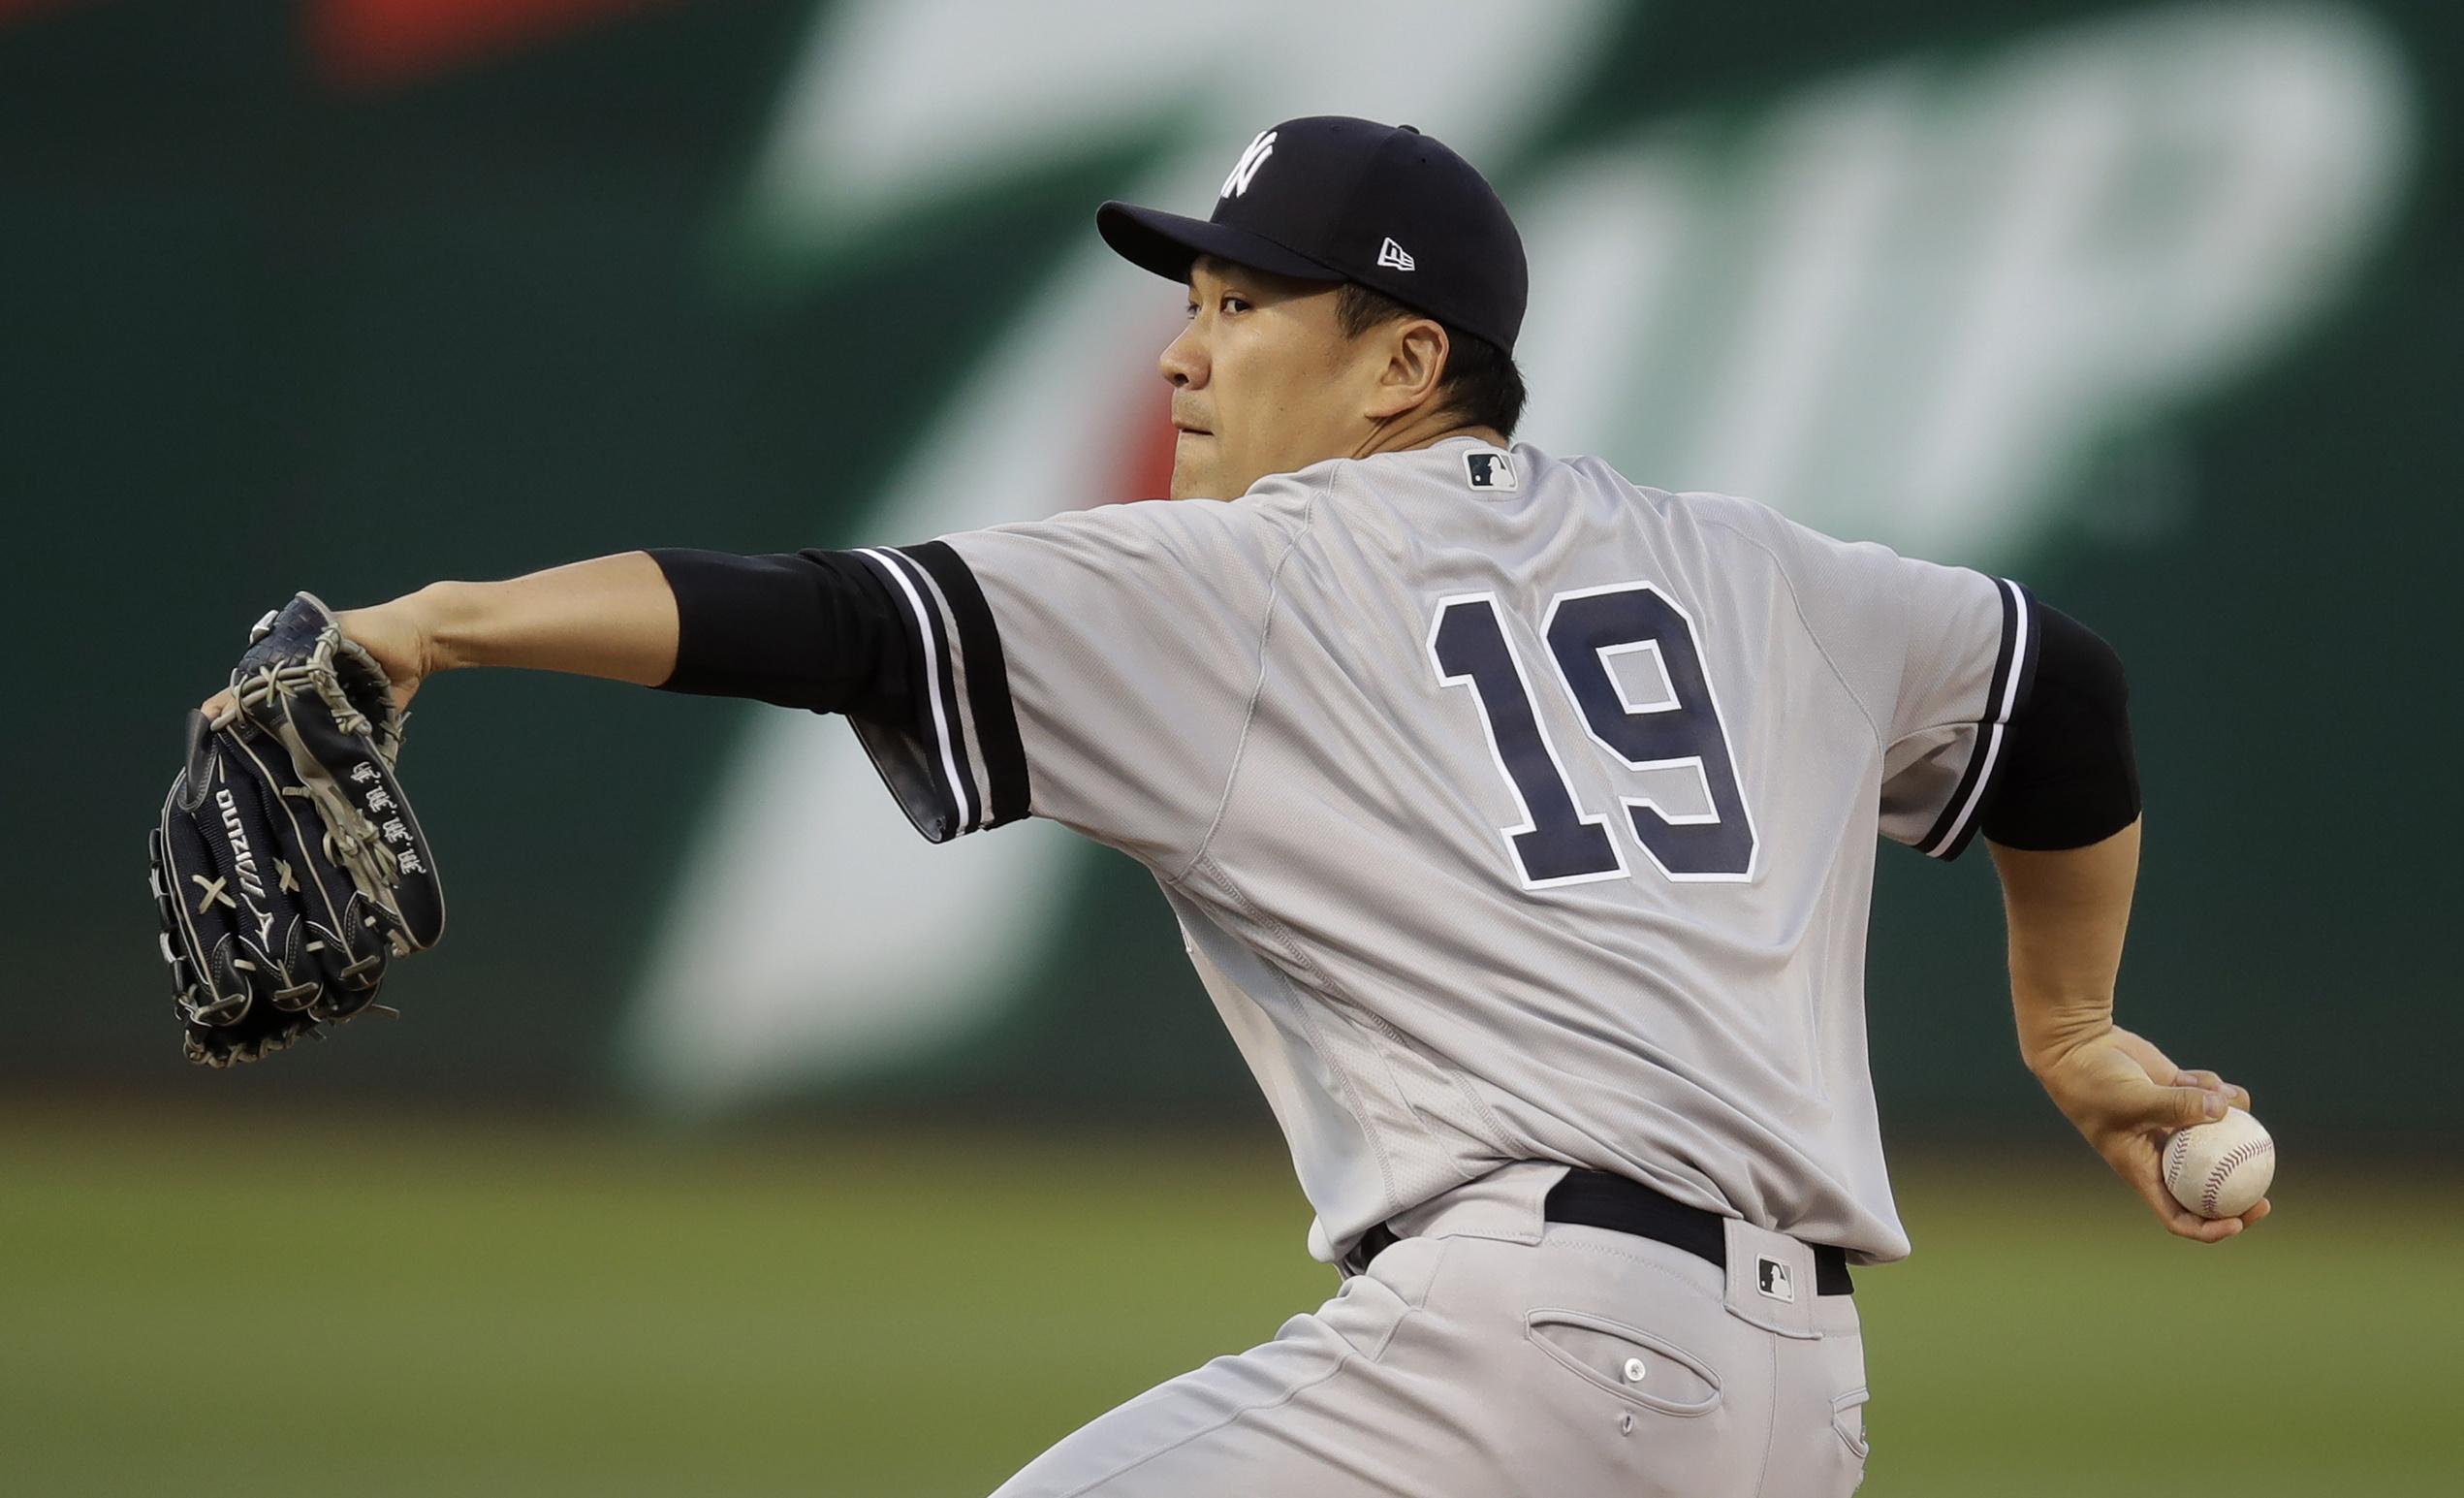 Houston Astros Vs New York Yankees In Game 1 Mlb Playoffs